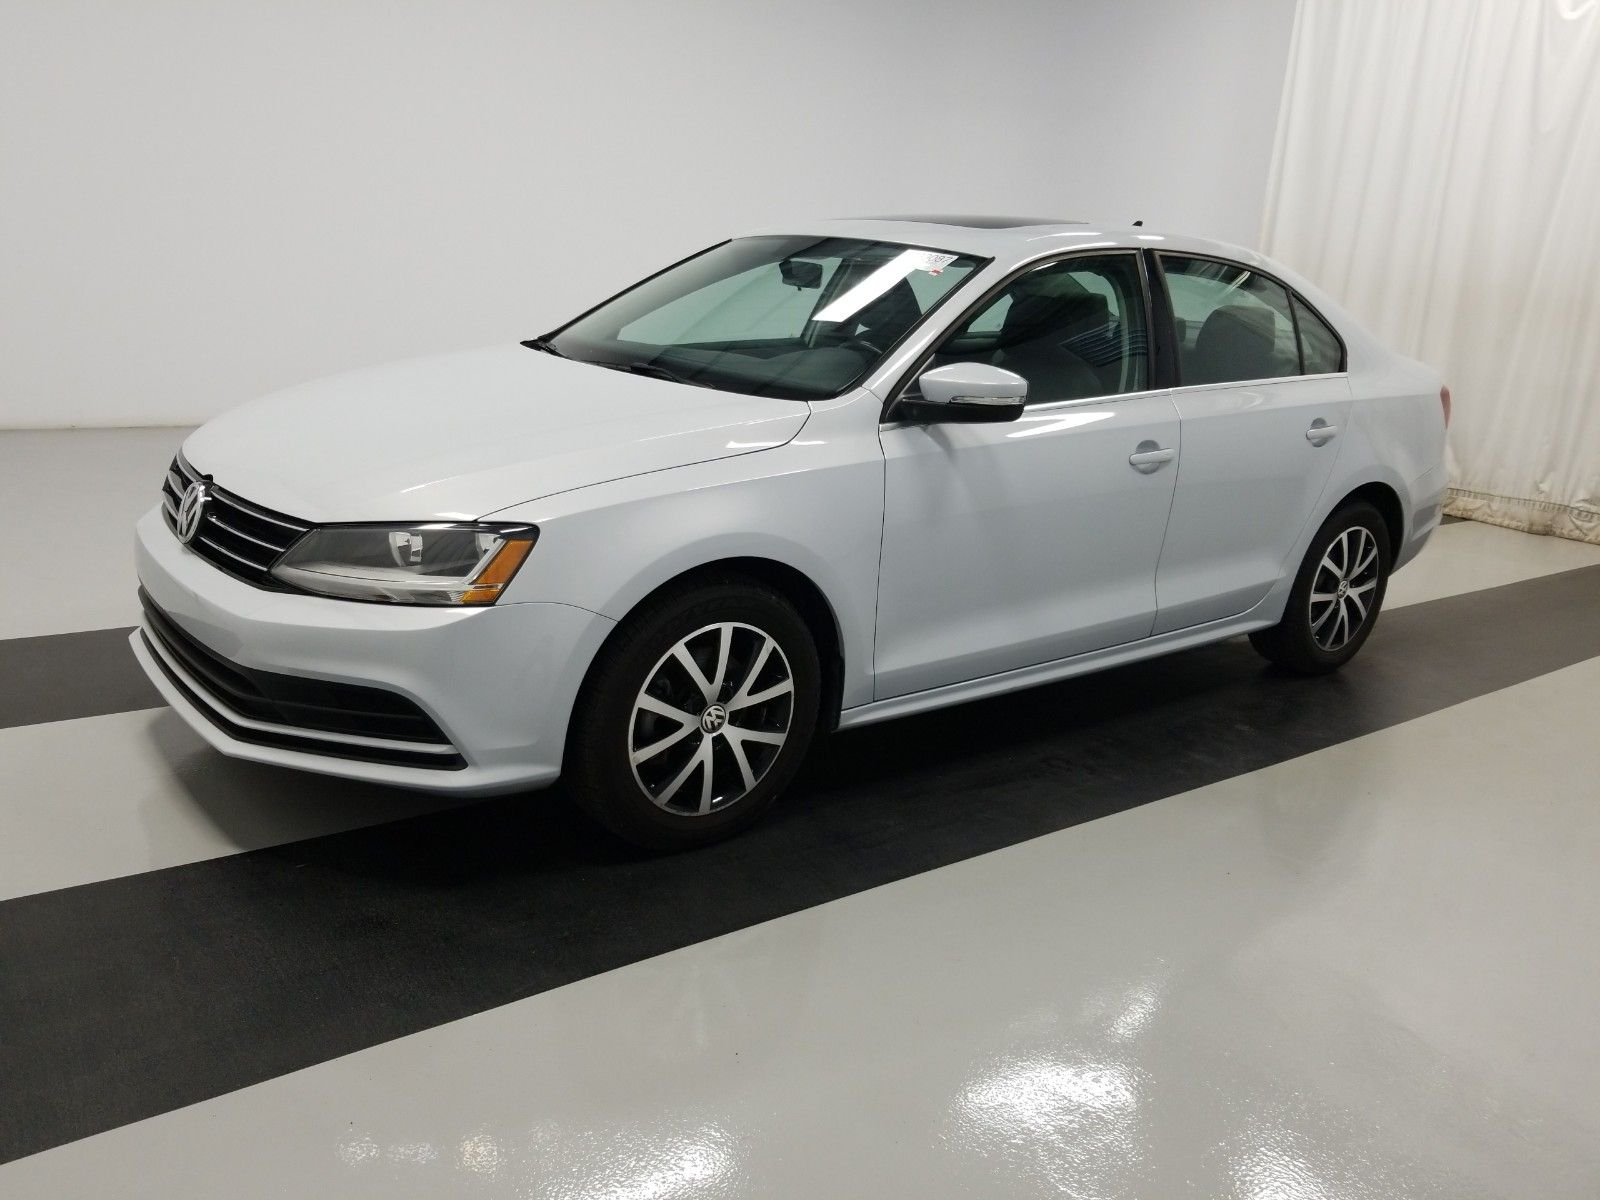 2017 Volkswagen Jetta 1.4. Lot 99914130398 Vin 3VWDB7AJ1HM340906